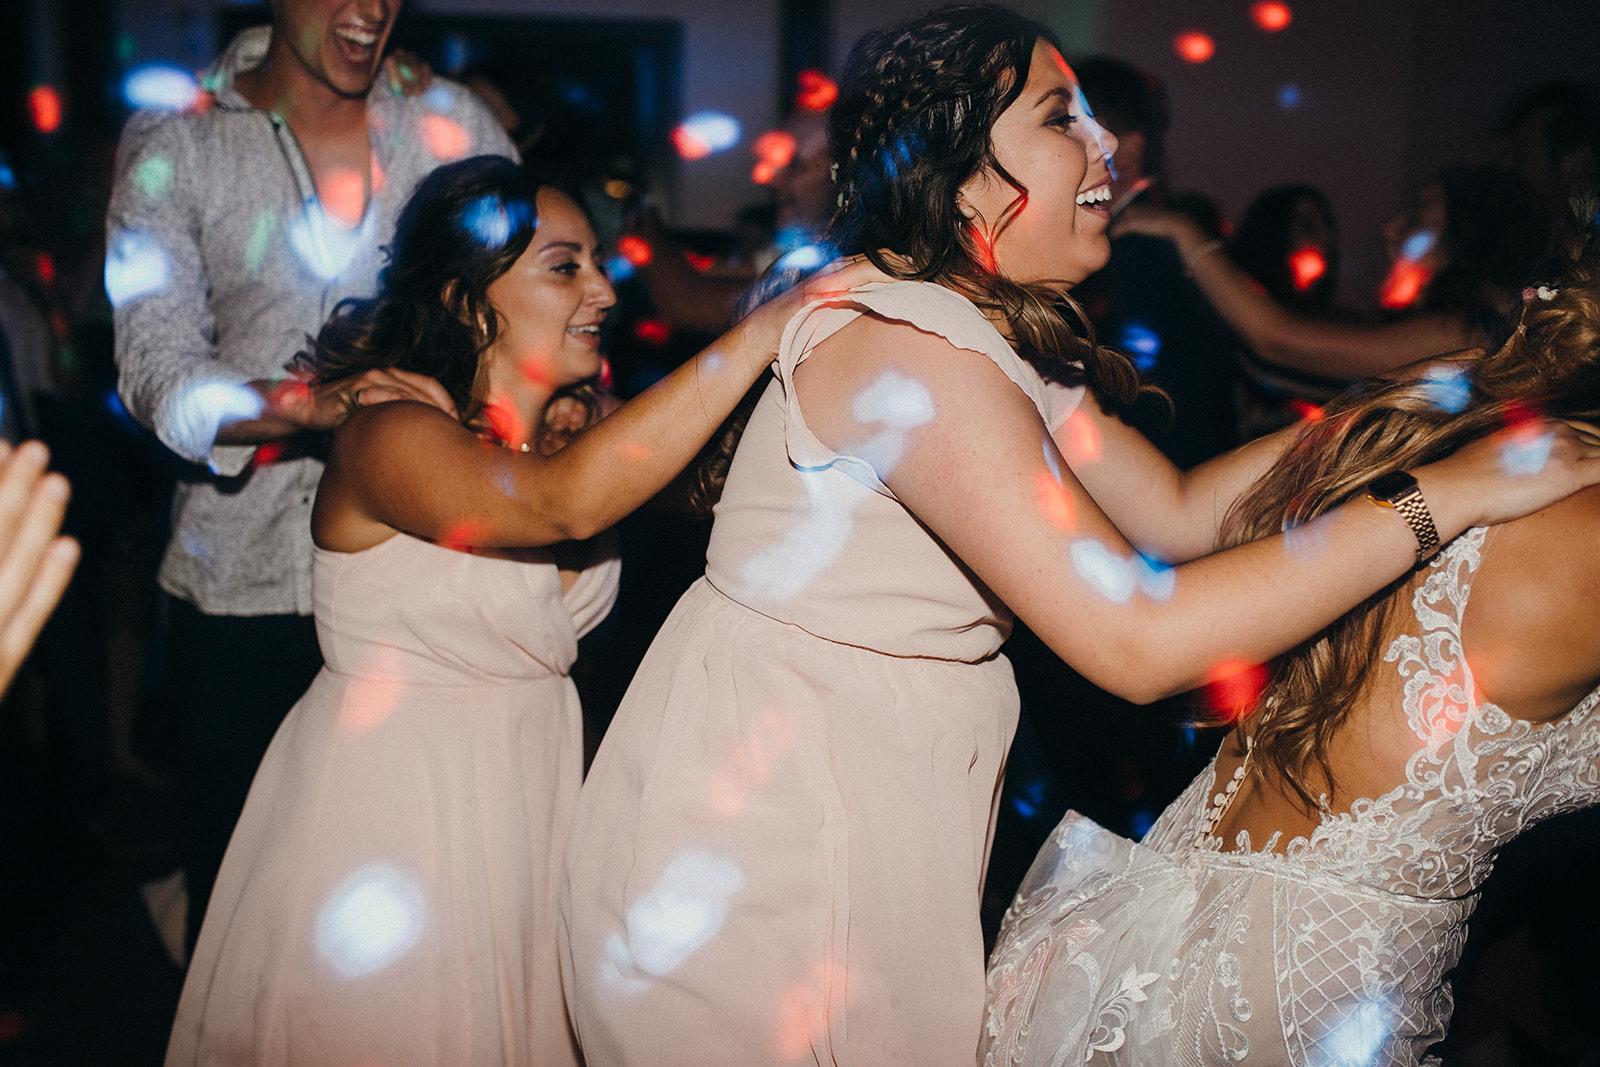 kaden_justine_wedding_4370.jpg